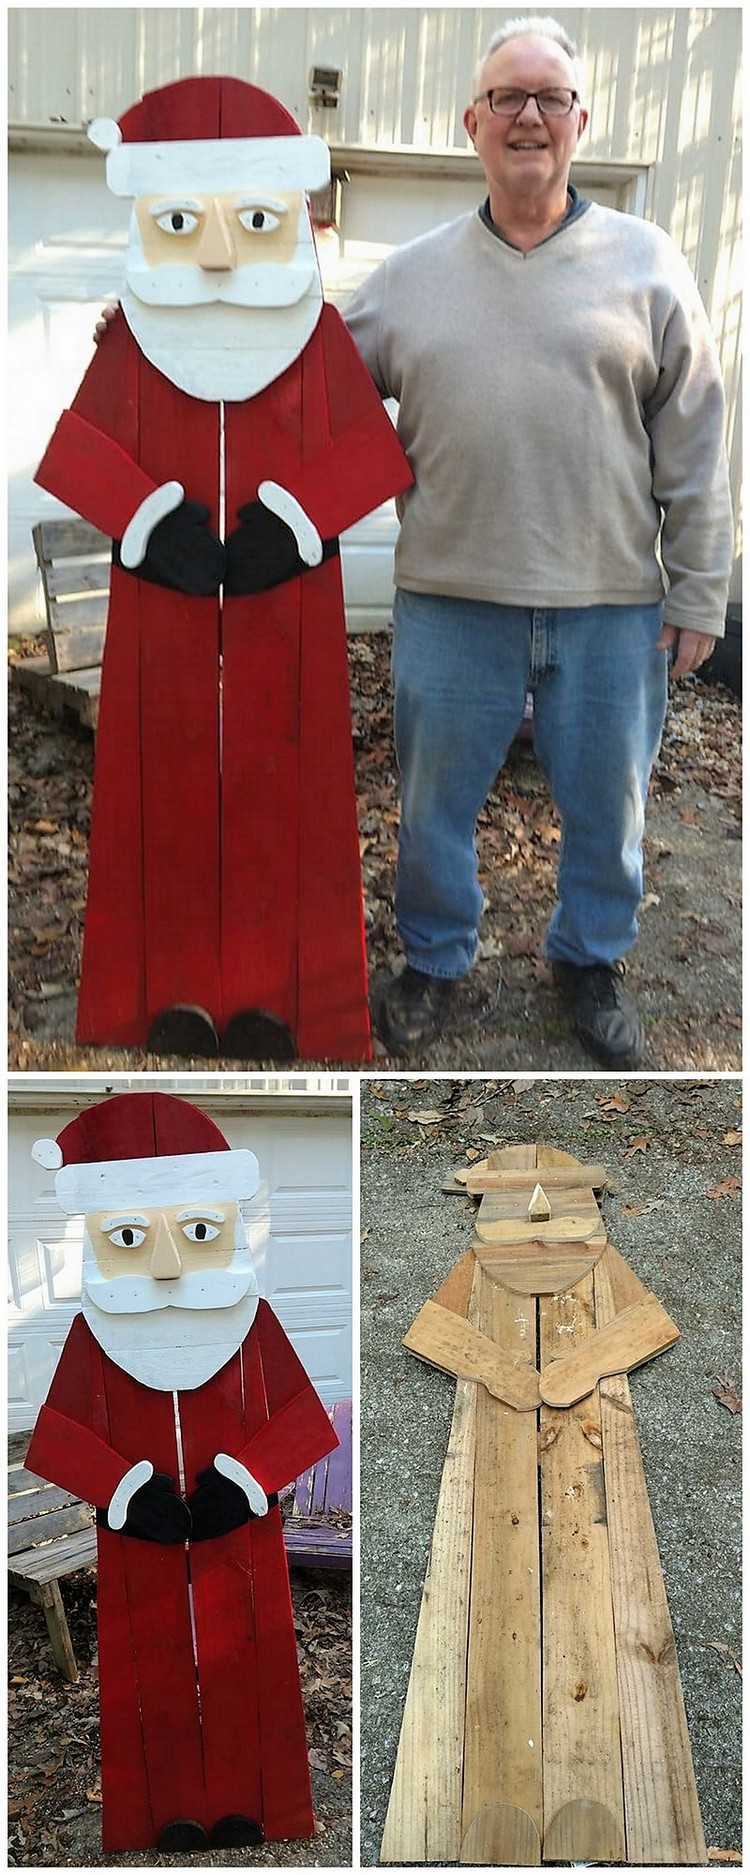 Pallet Santa Claus